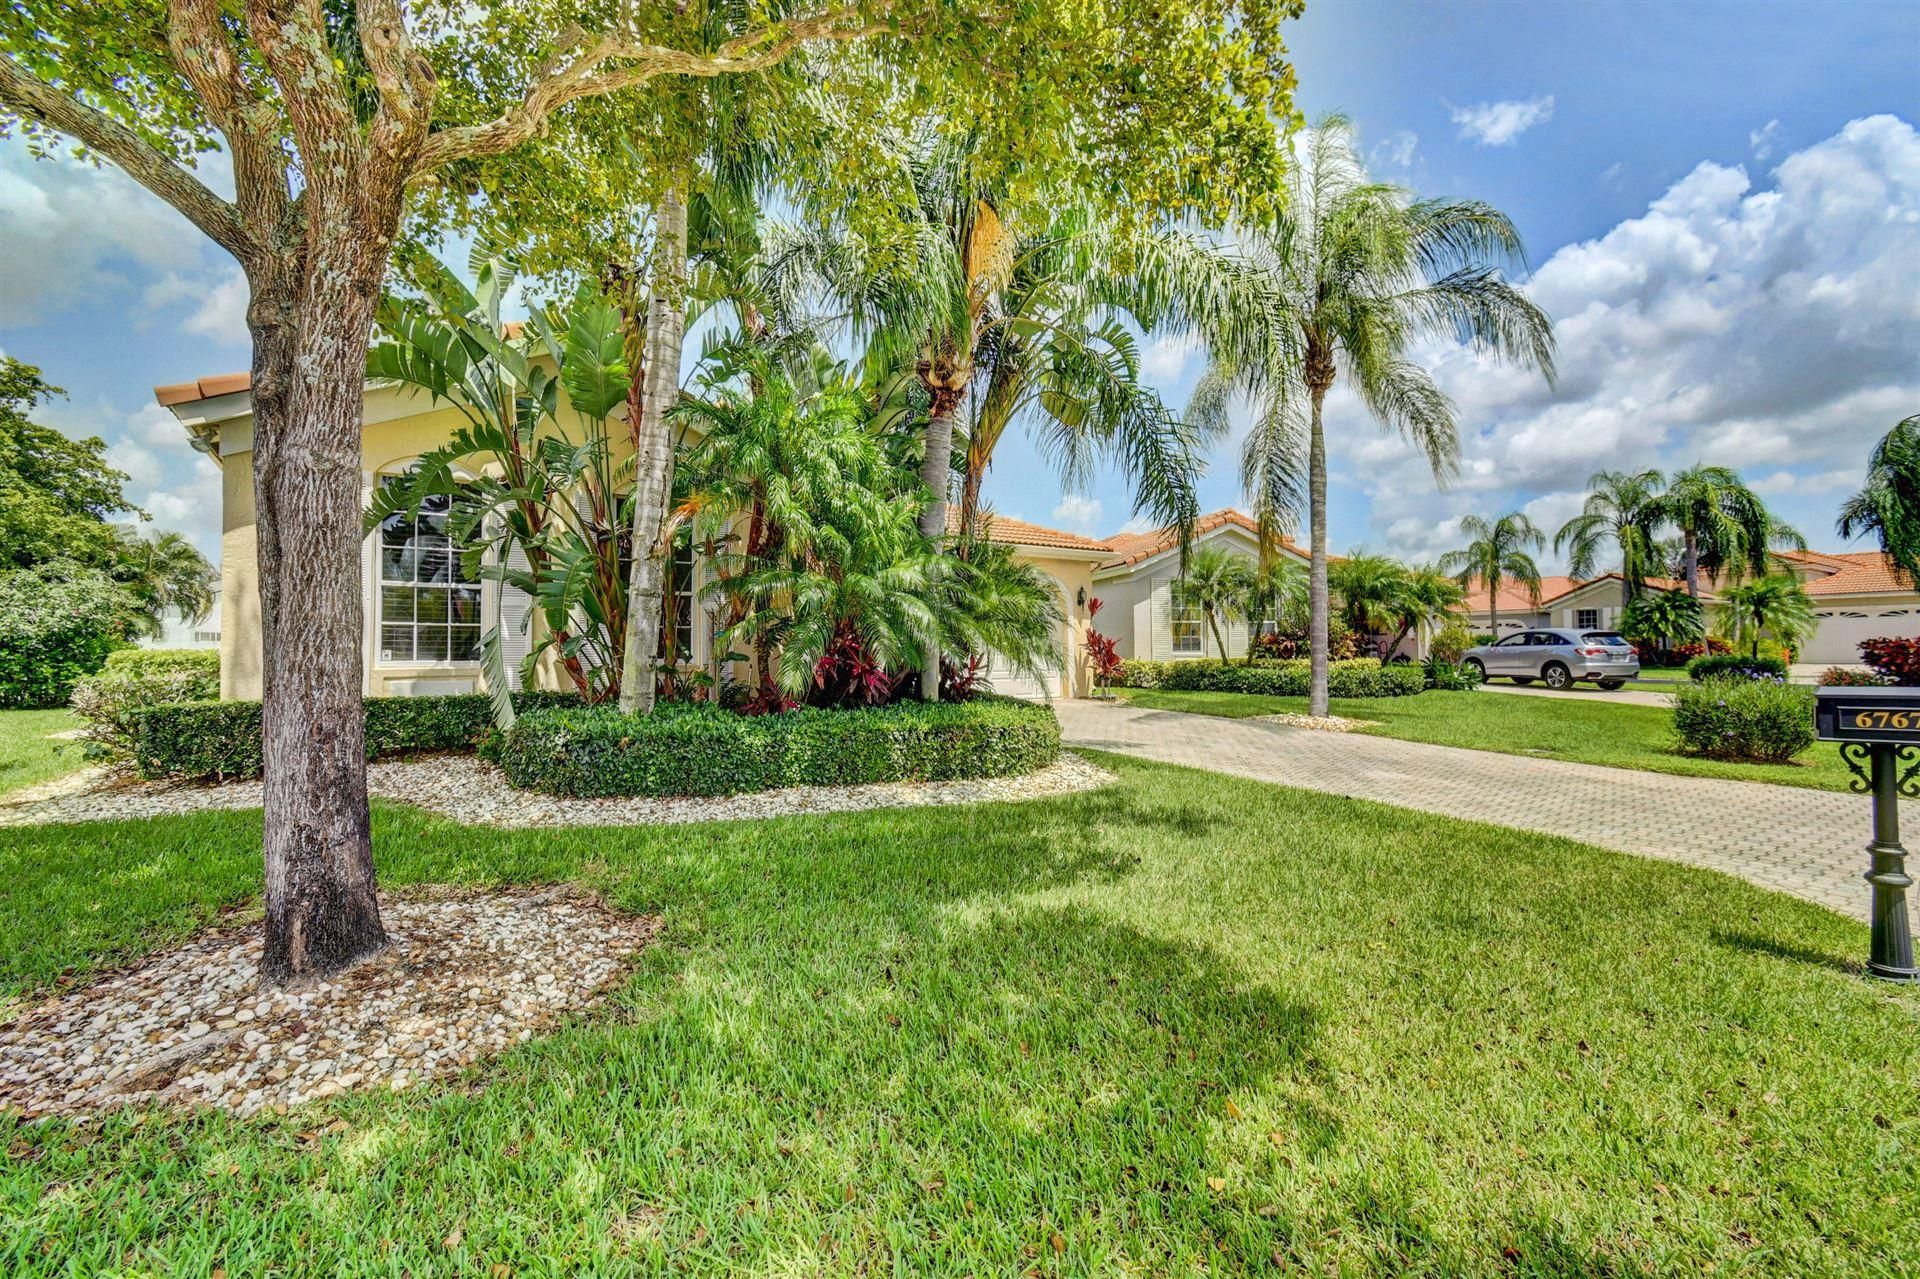 Photo of 6767 Portside Drive, Boca Raton, FL 33496 (MLS # RX-10635747)